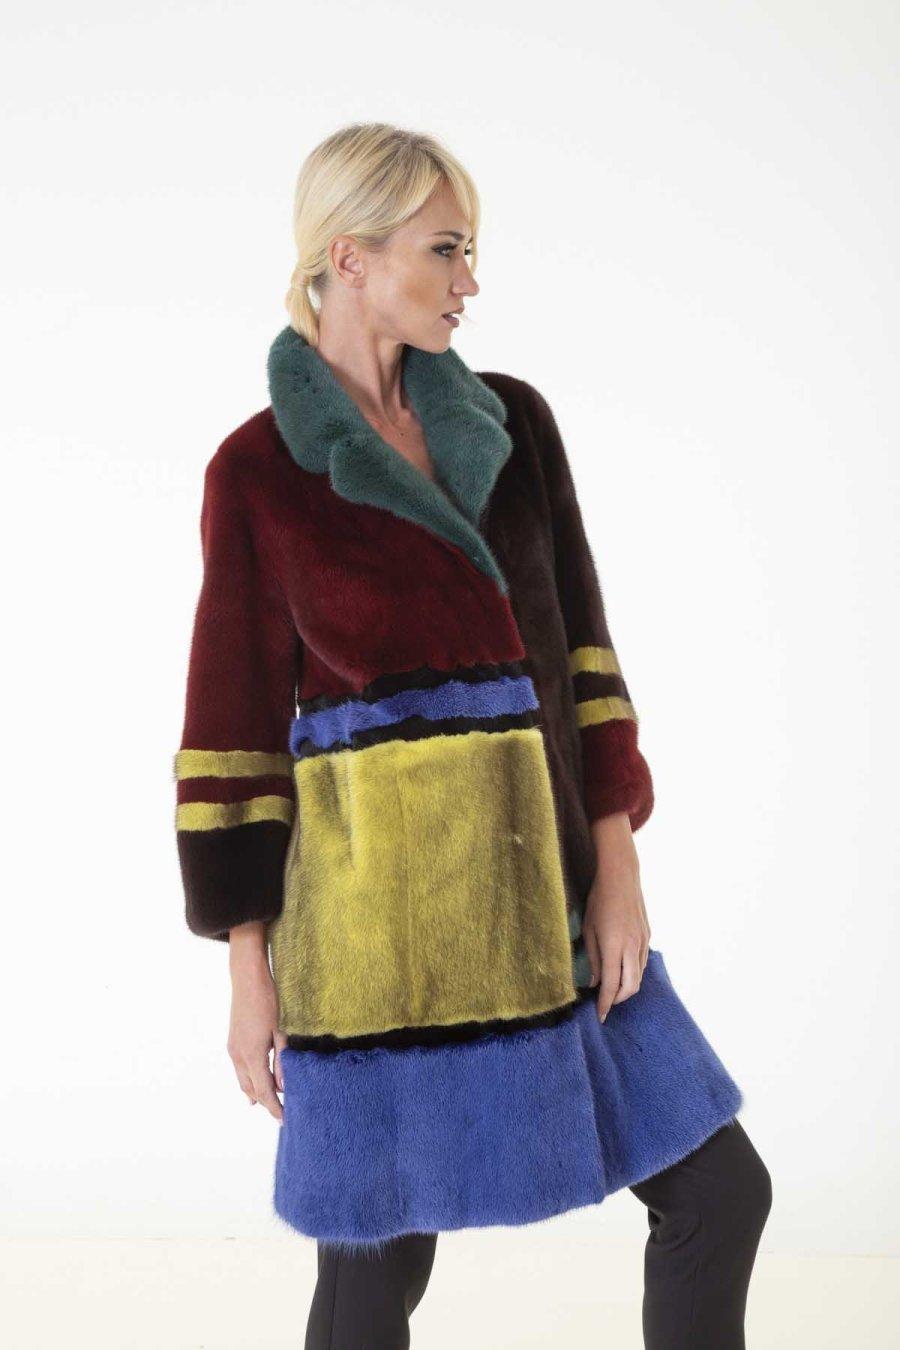 Male Mink Kopenhagen Jacket | Пальто из меха норки Kopenhagen - Sarigianni Furs